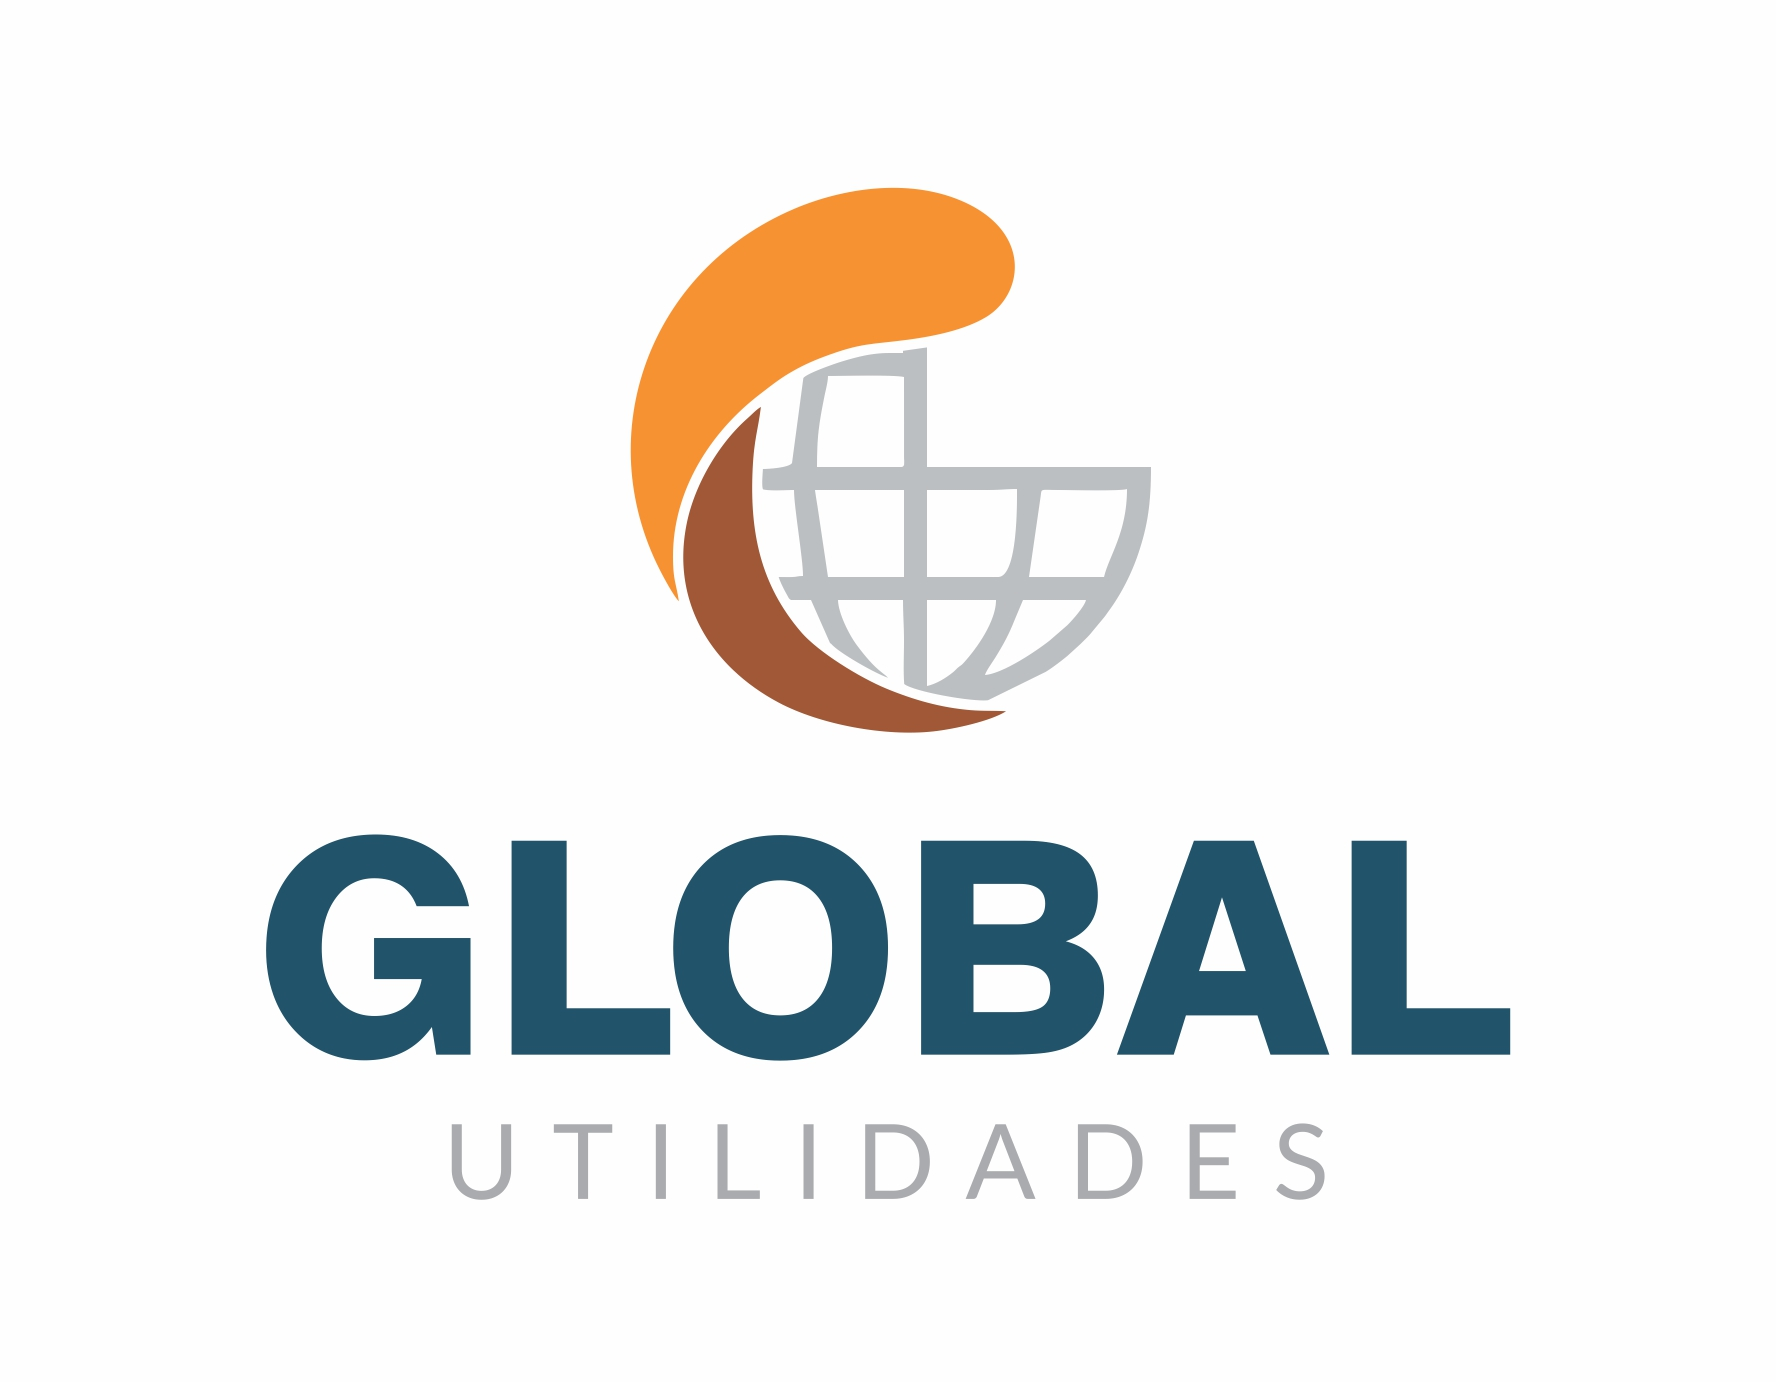 GLOBAL UTILIDADES